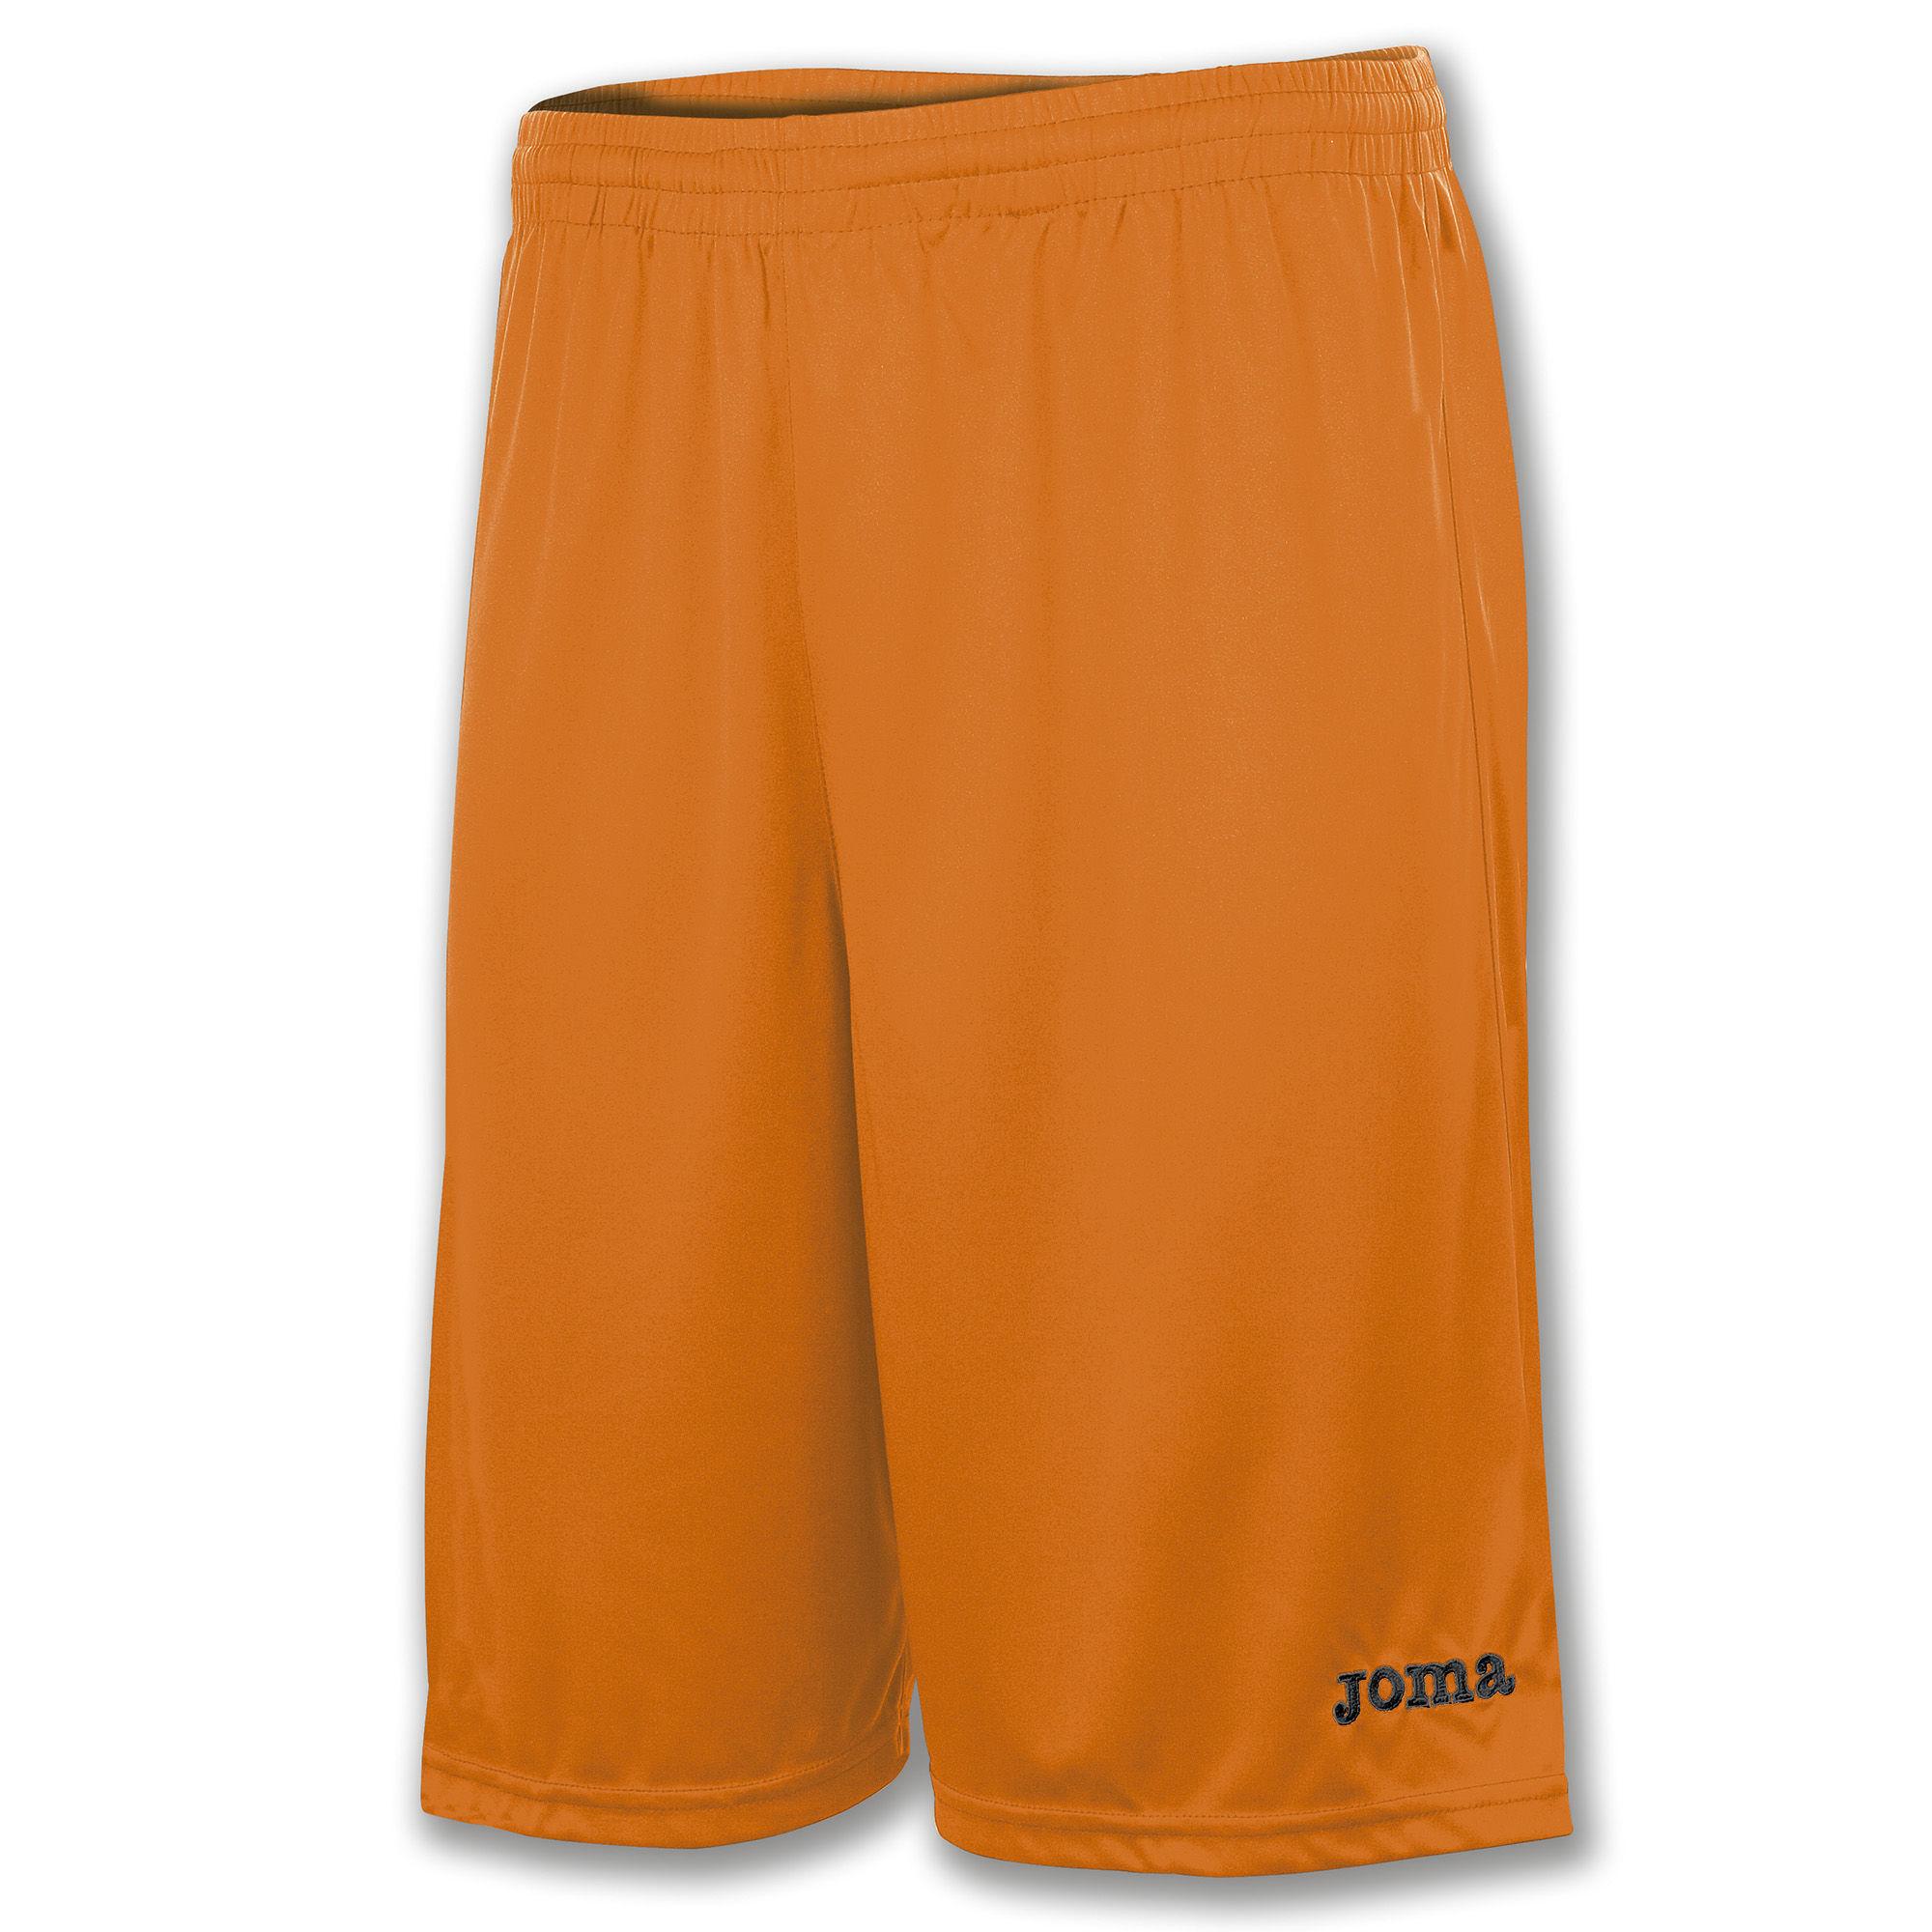 e6625561 Баскетбольные шорты для баскетбола. Этот товар продаёт JOMA Артикул 100051.  цена: 299 лей в корзину